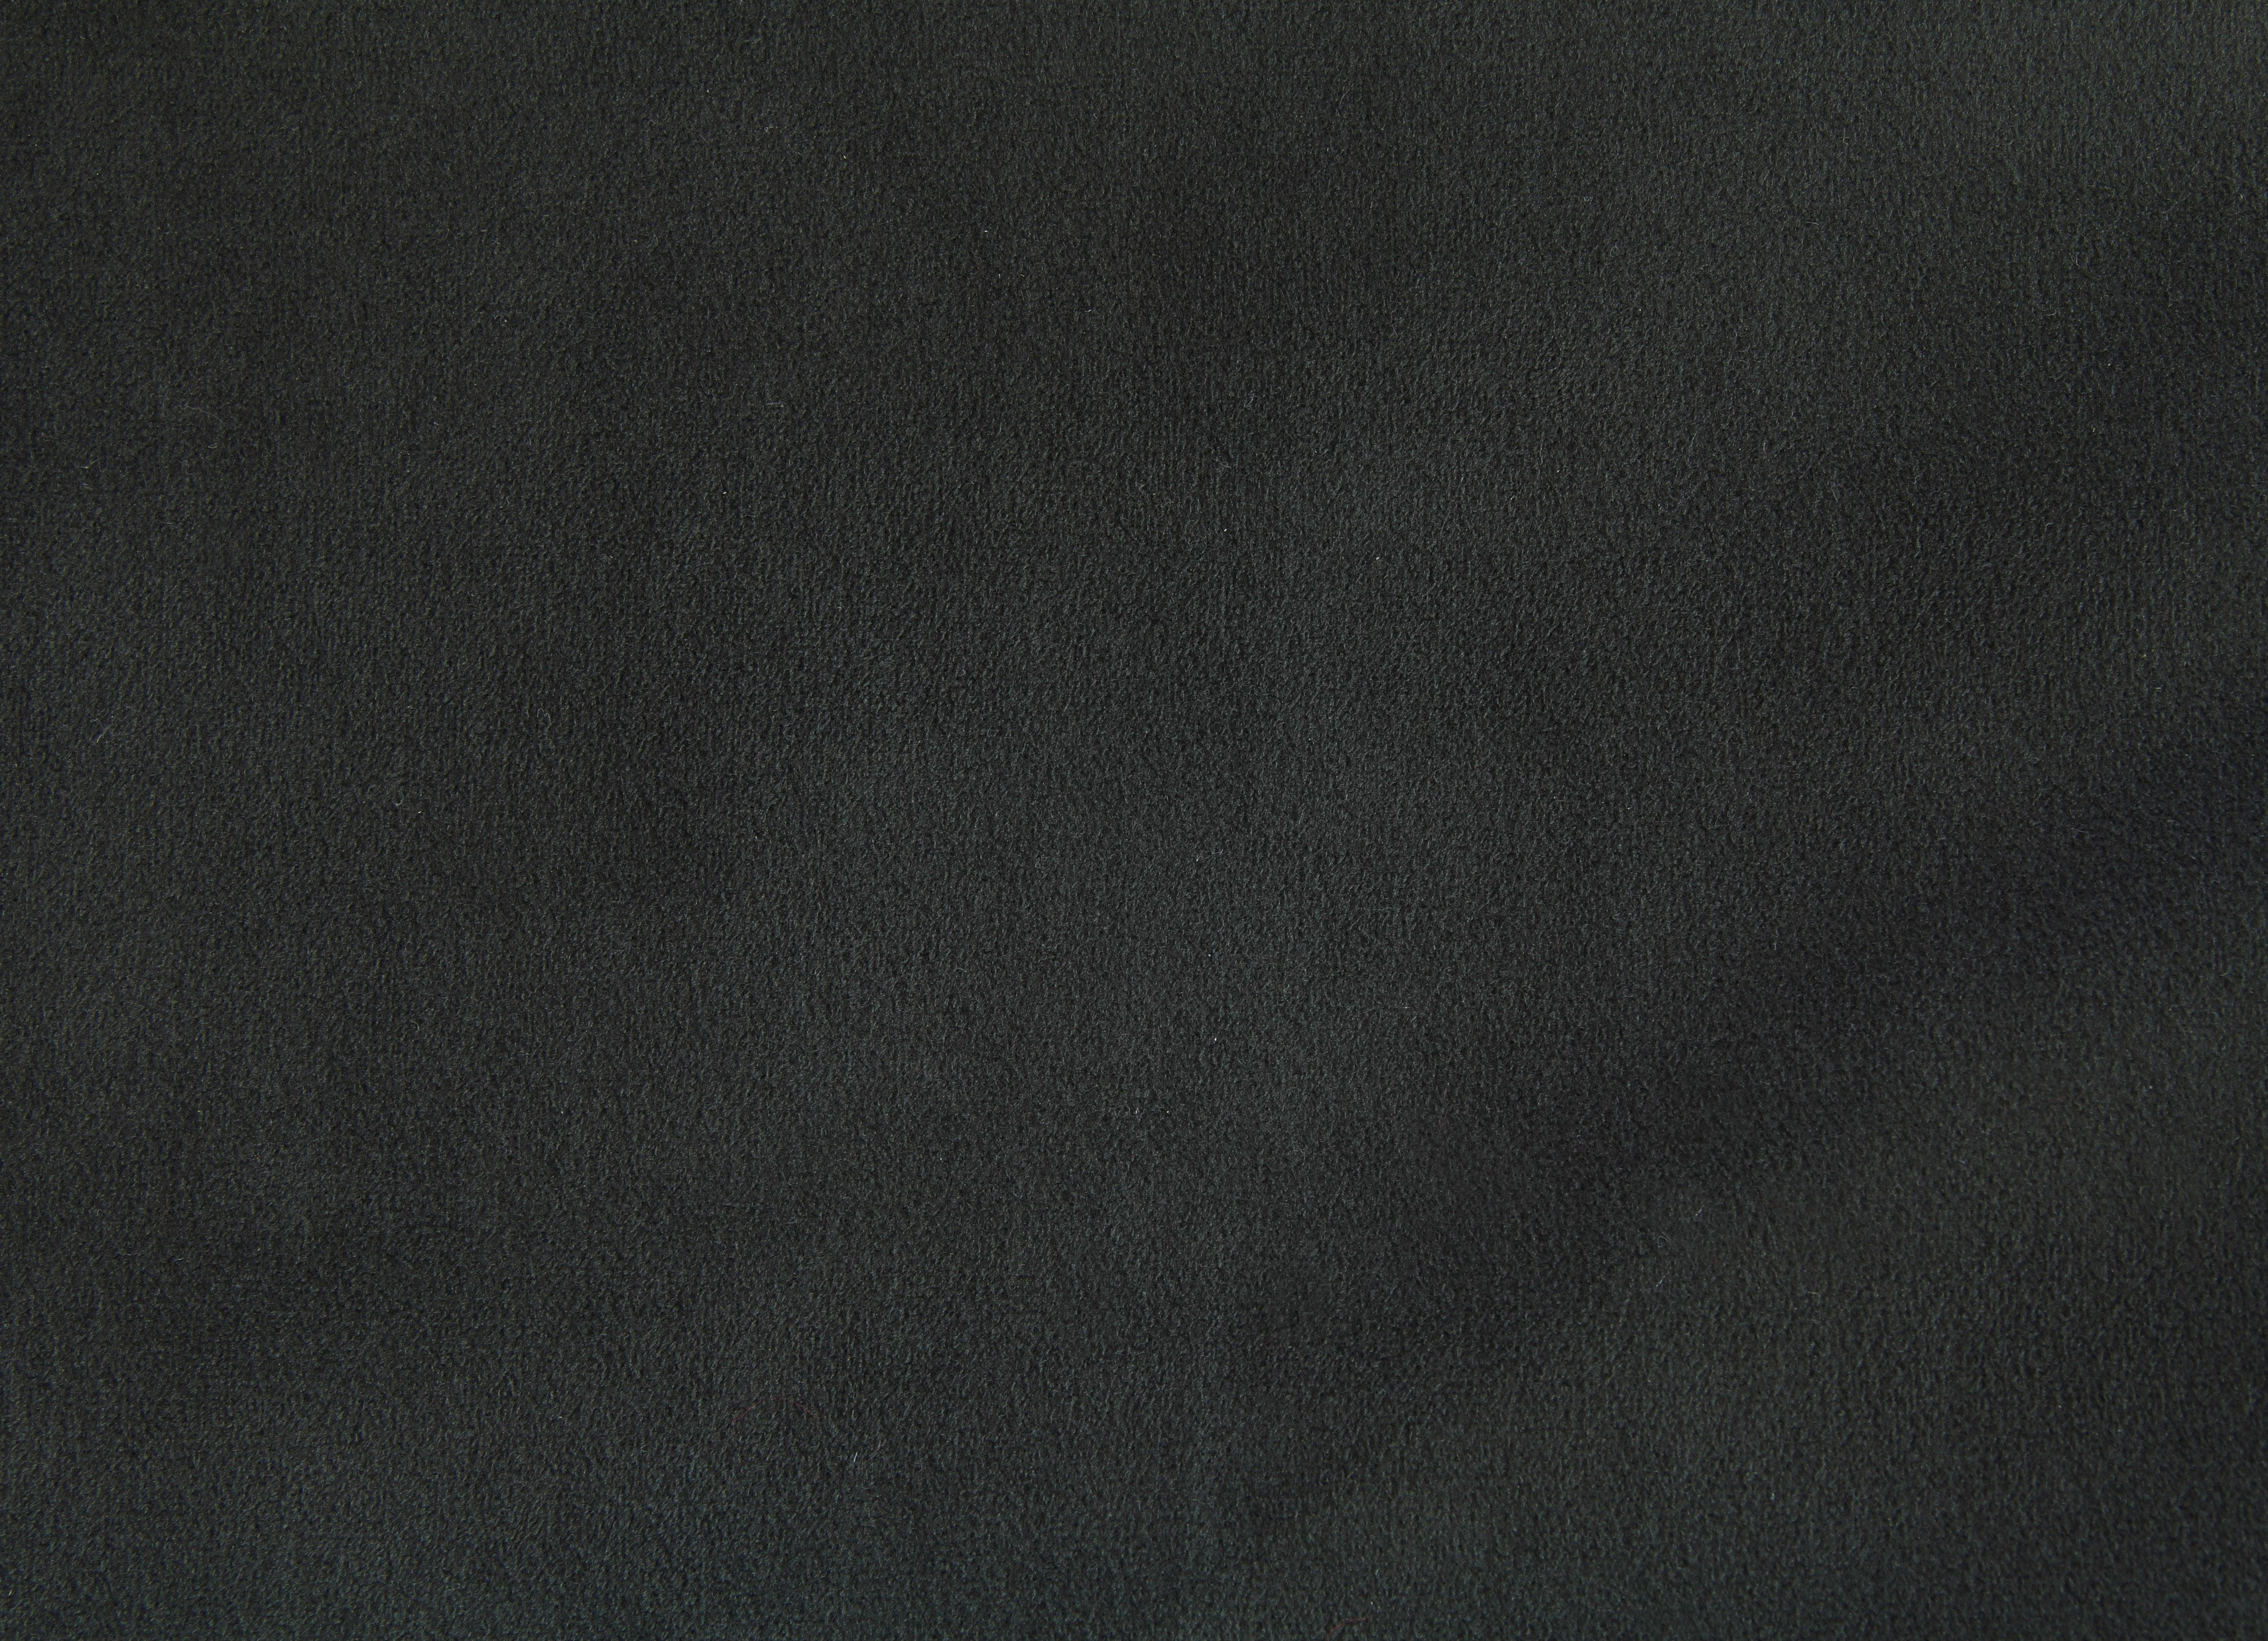 black fabric texture soft cloth suede fuzzy stock photo - TextureX ...